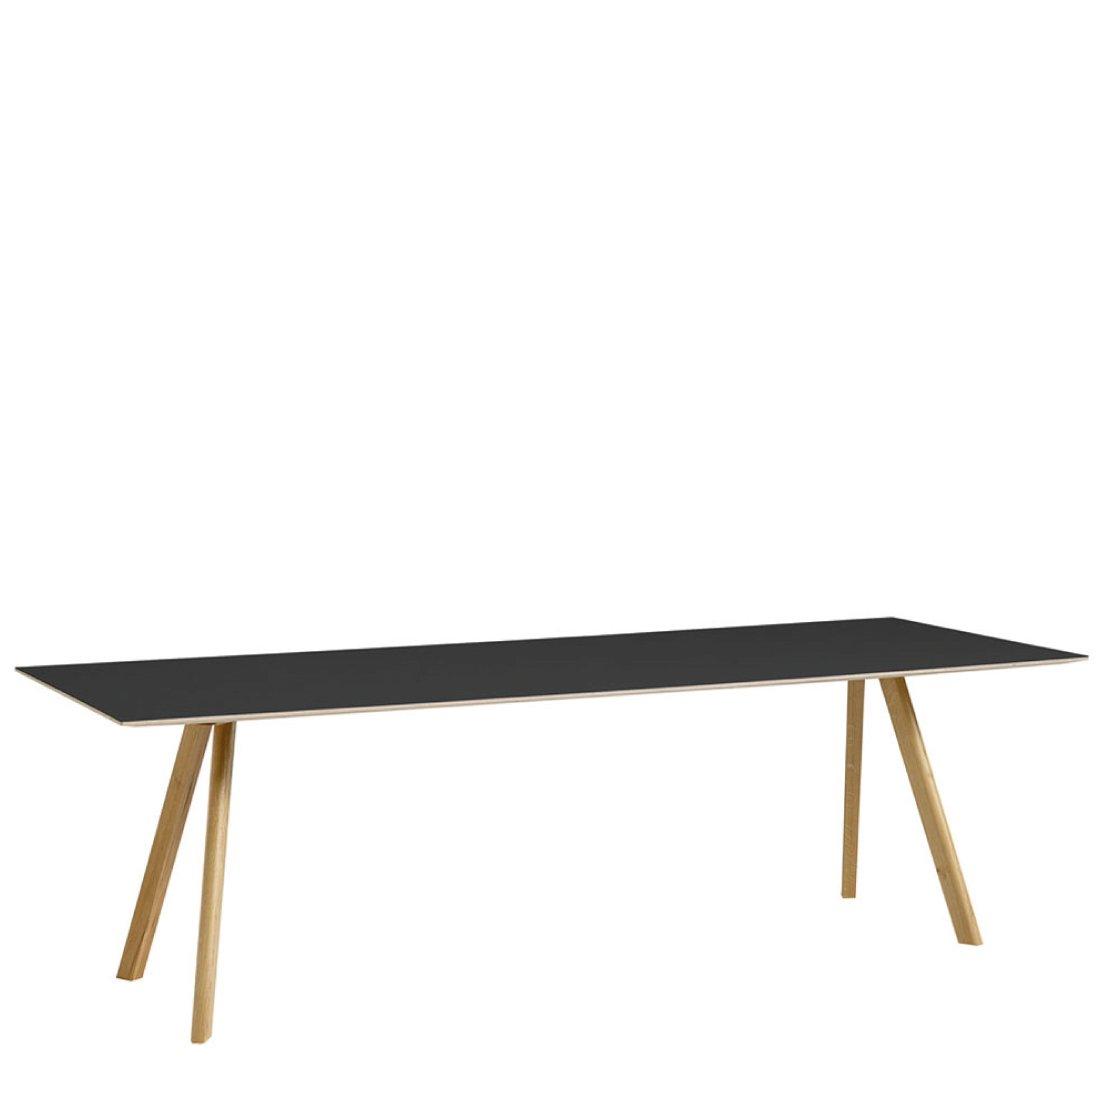 HAY CPH30 Tafel 250 x 90 cm Gelakt Eiken - Zwart